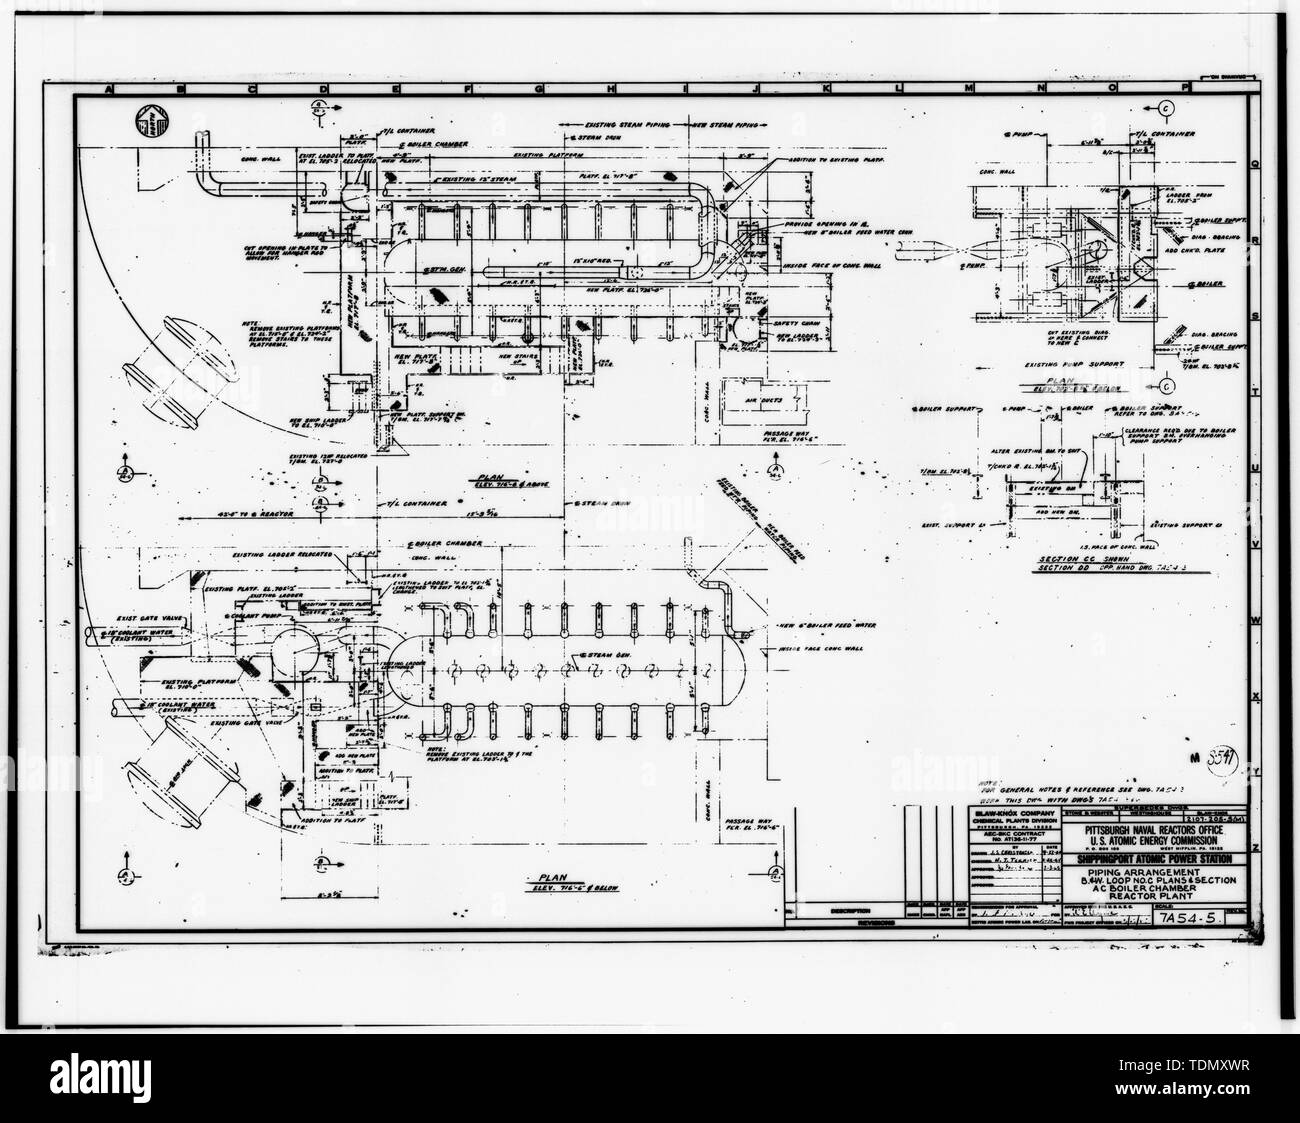 Oil Burner Wiring Diagram Duquesne on